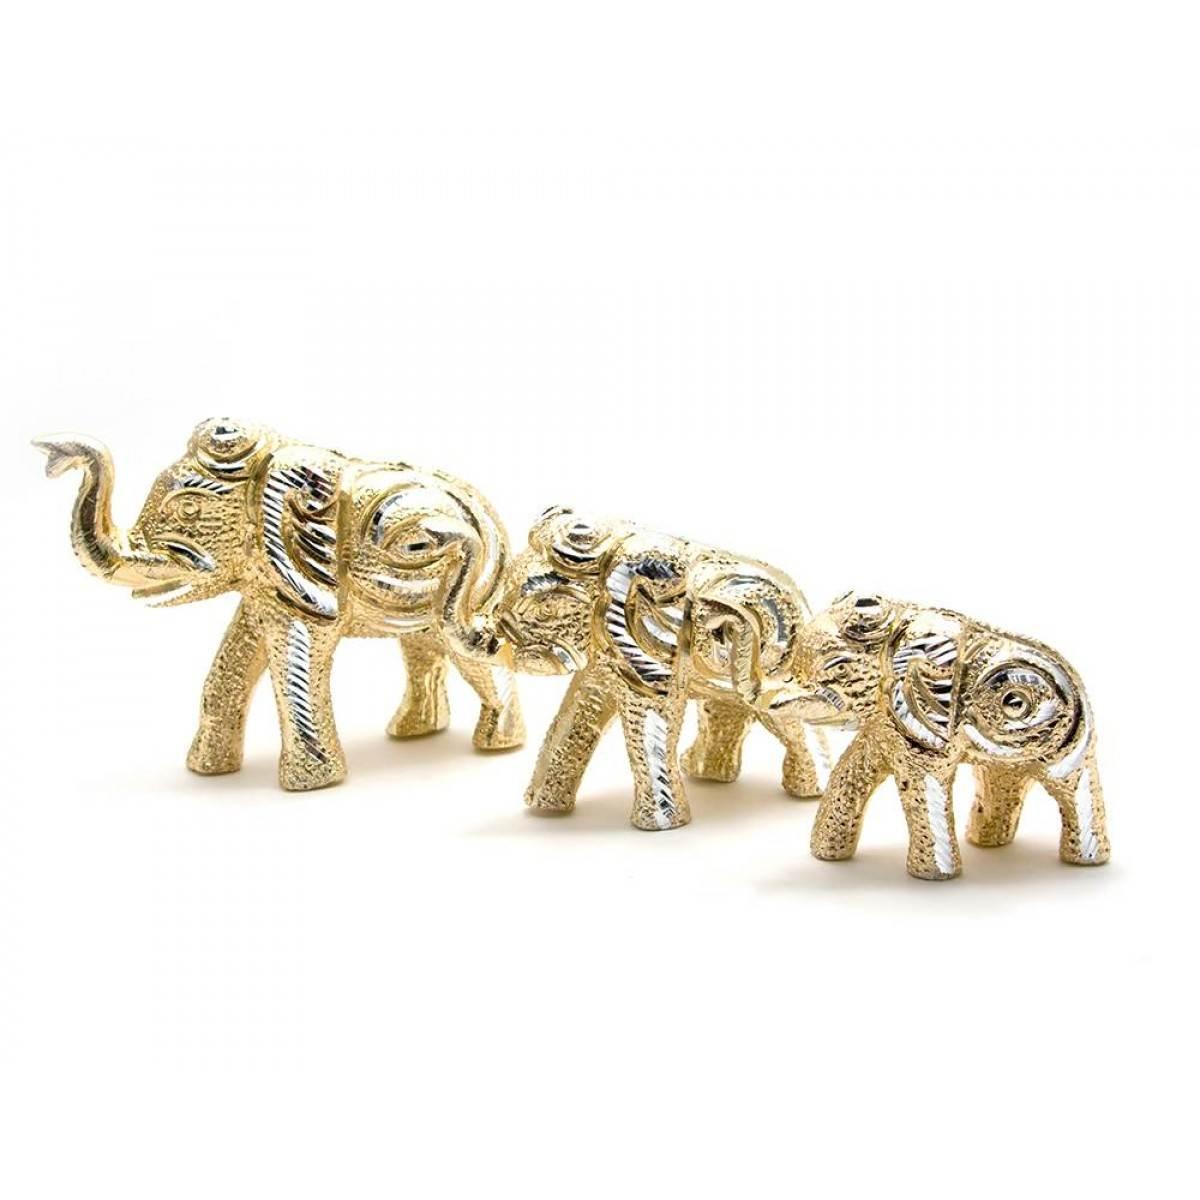 Слоны резные алюминий н-р 3 шт 11,5х7,5см8х6см8х5,5см 25893